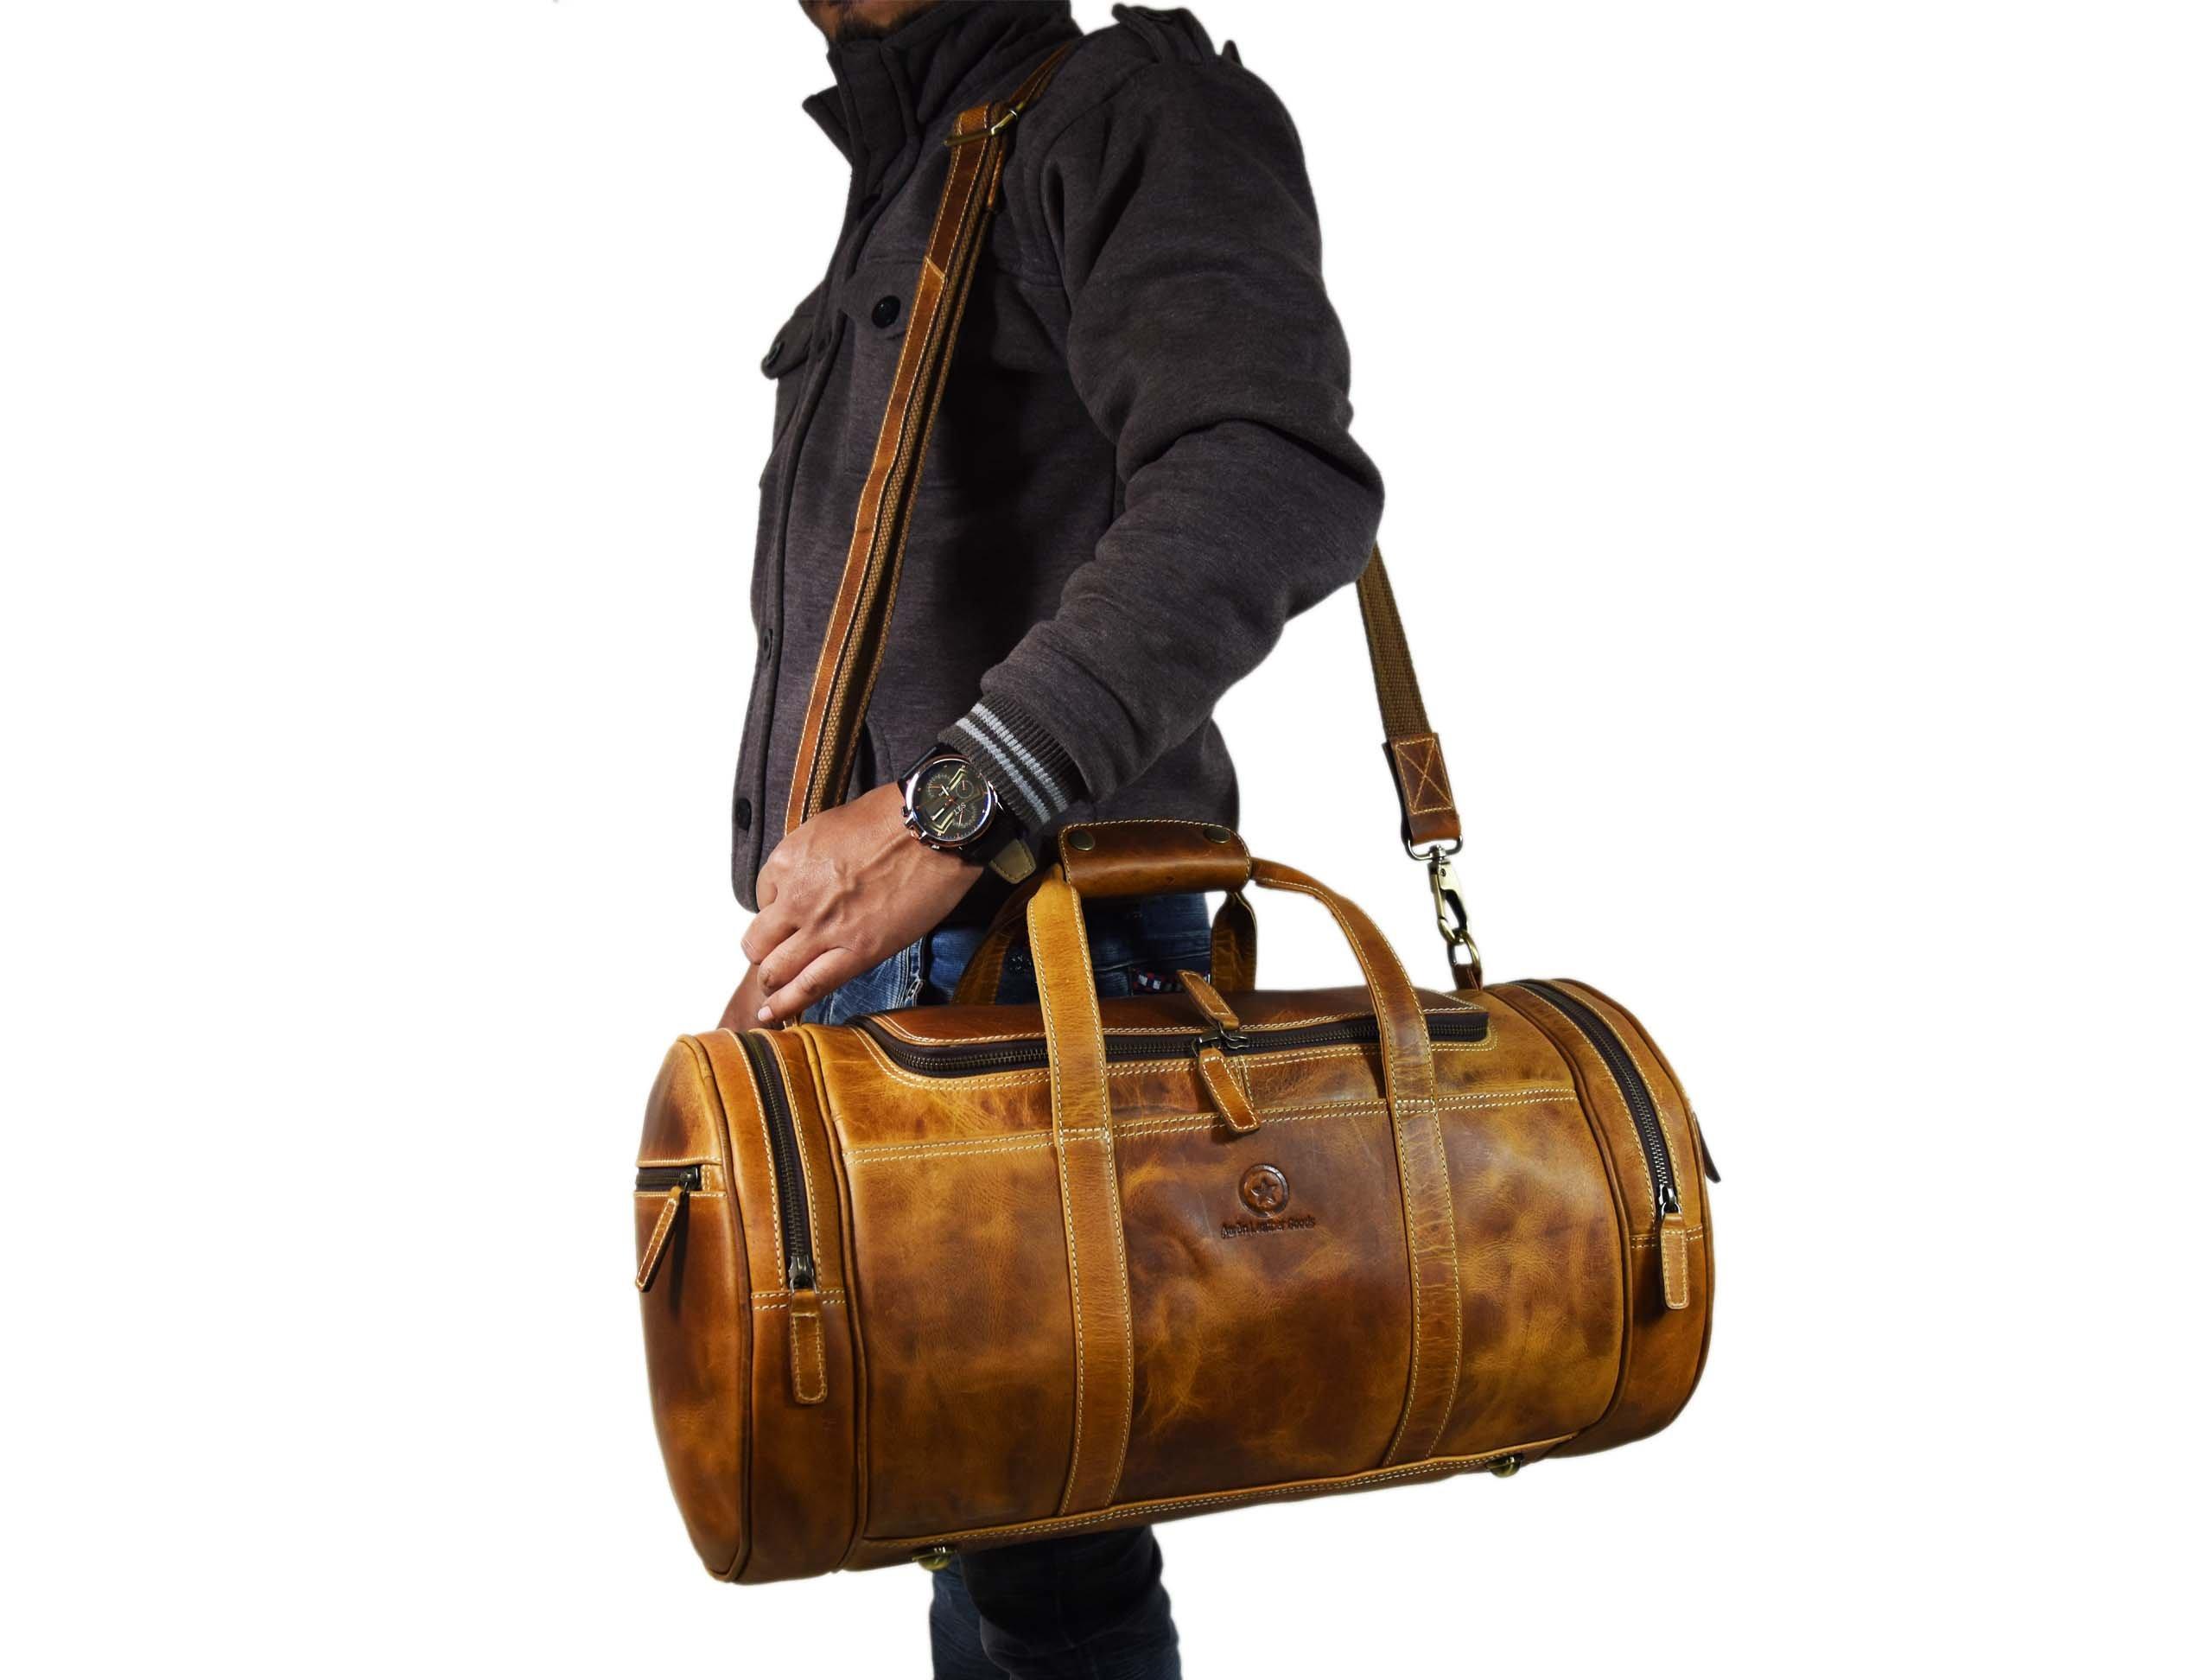 Travel Duffel Overnight Barrel Weekend Leather Bag by Aaron Leather (Brown) by Aaron Leather (Image #6)